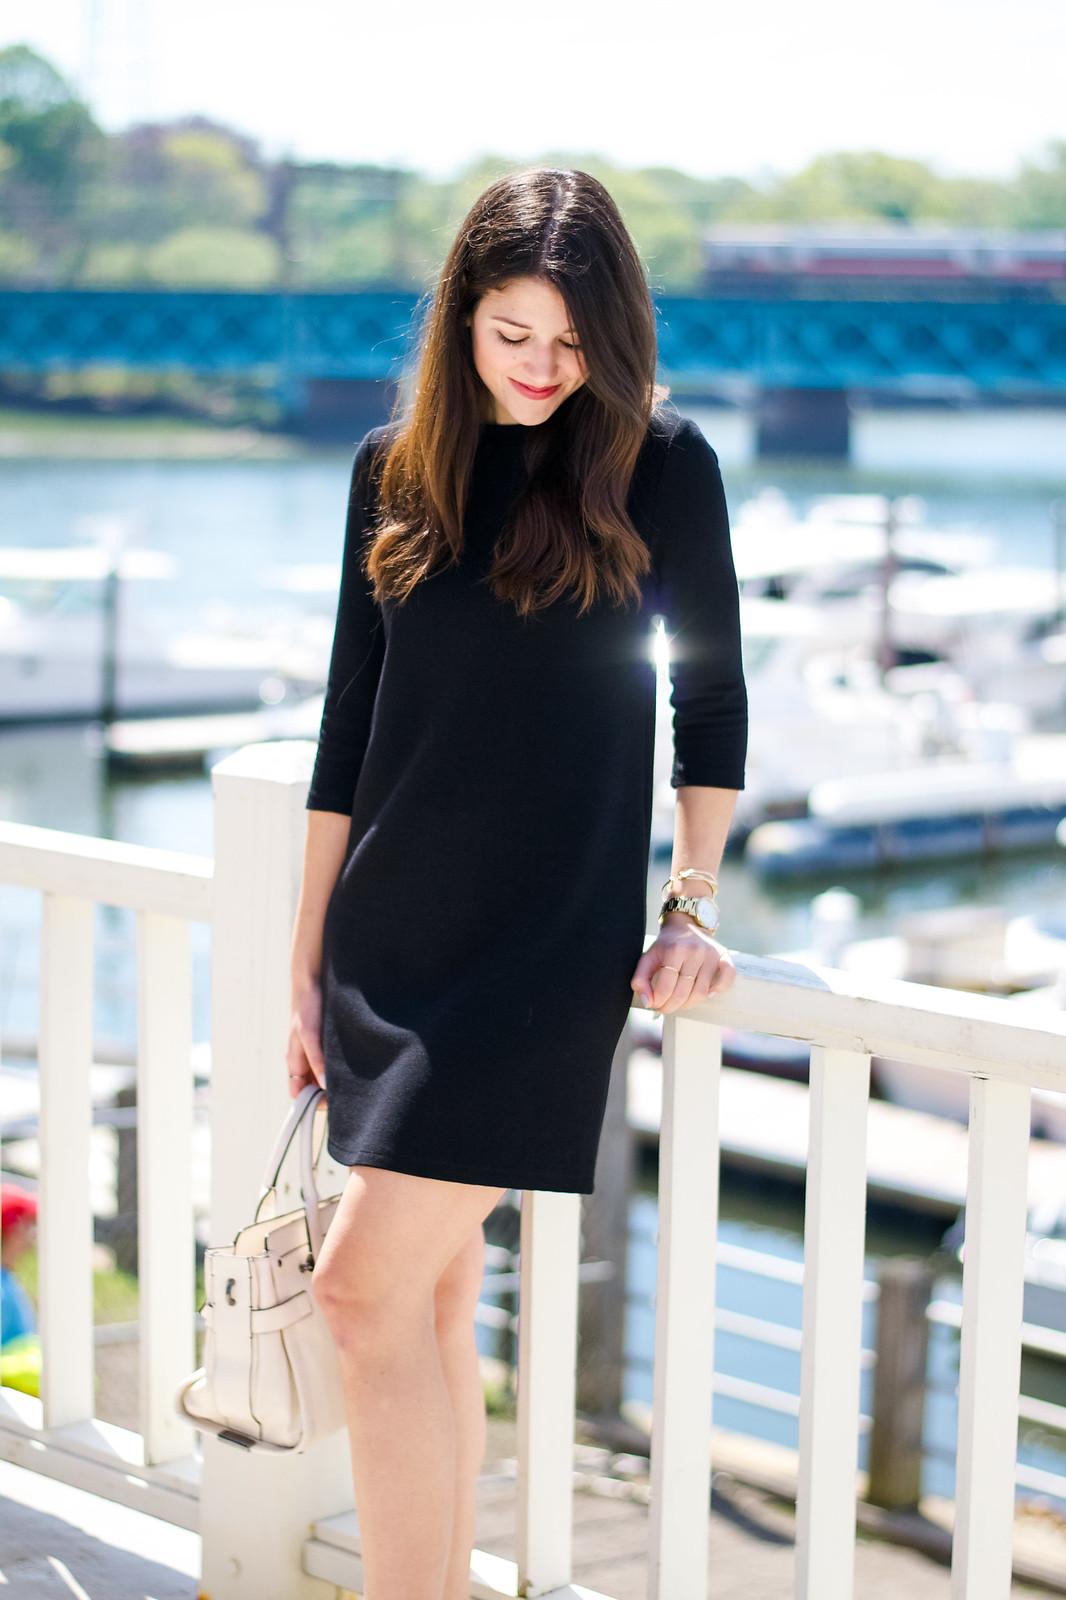 Black Dress Blush Heels Outfit Idea